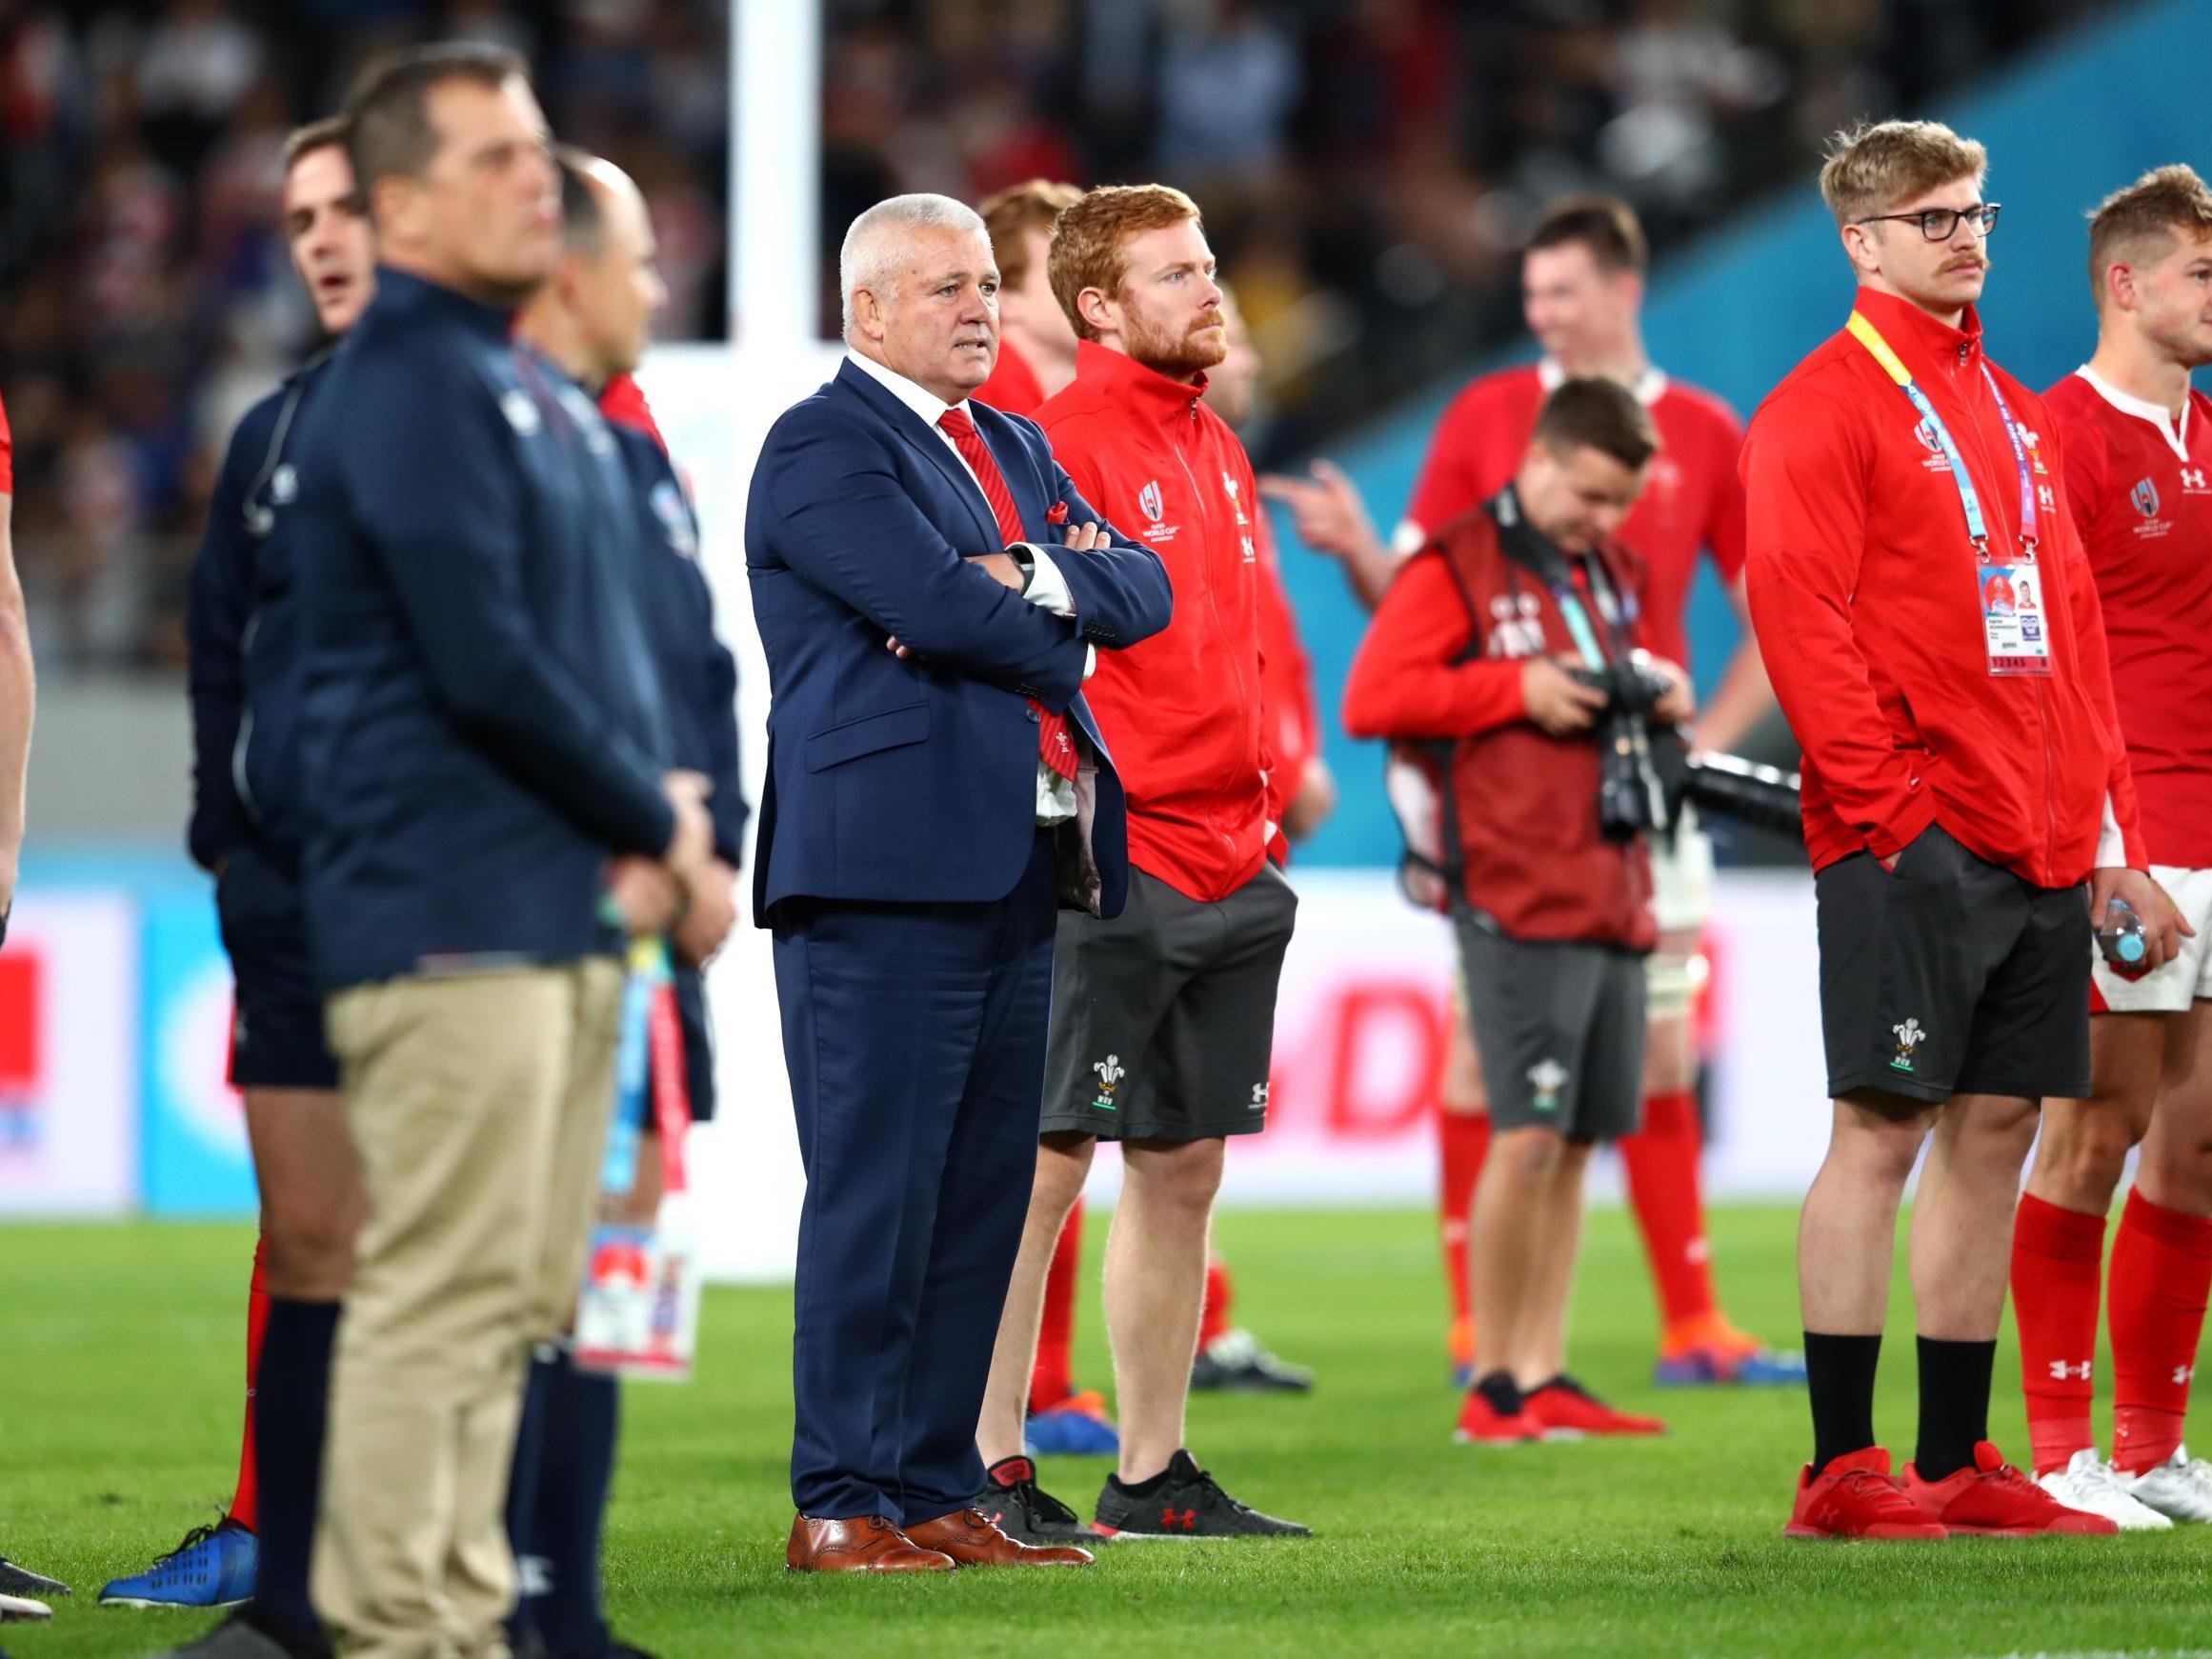 New Zealand vs Gatland: 'It would break my heart to see Welsh back in the doldrums,' says Warren Gatland